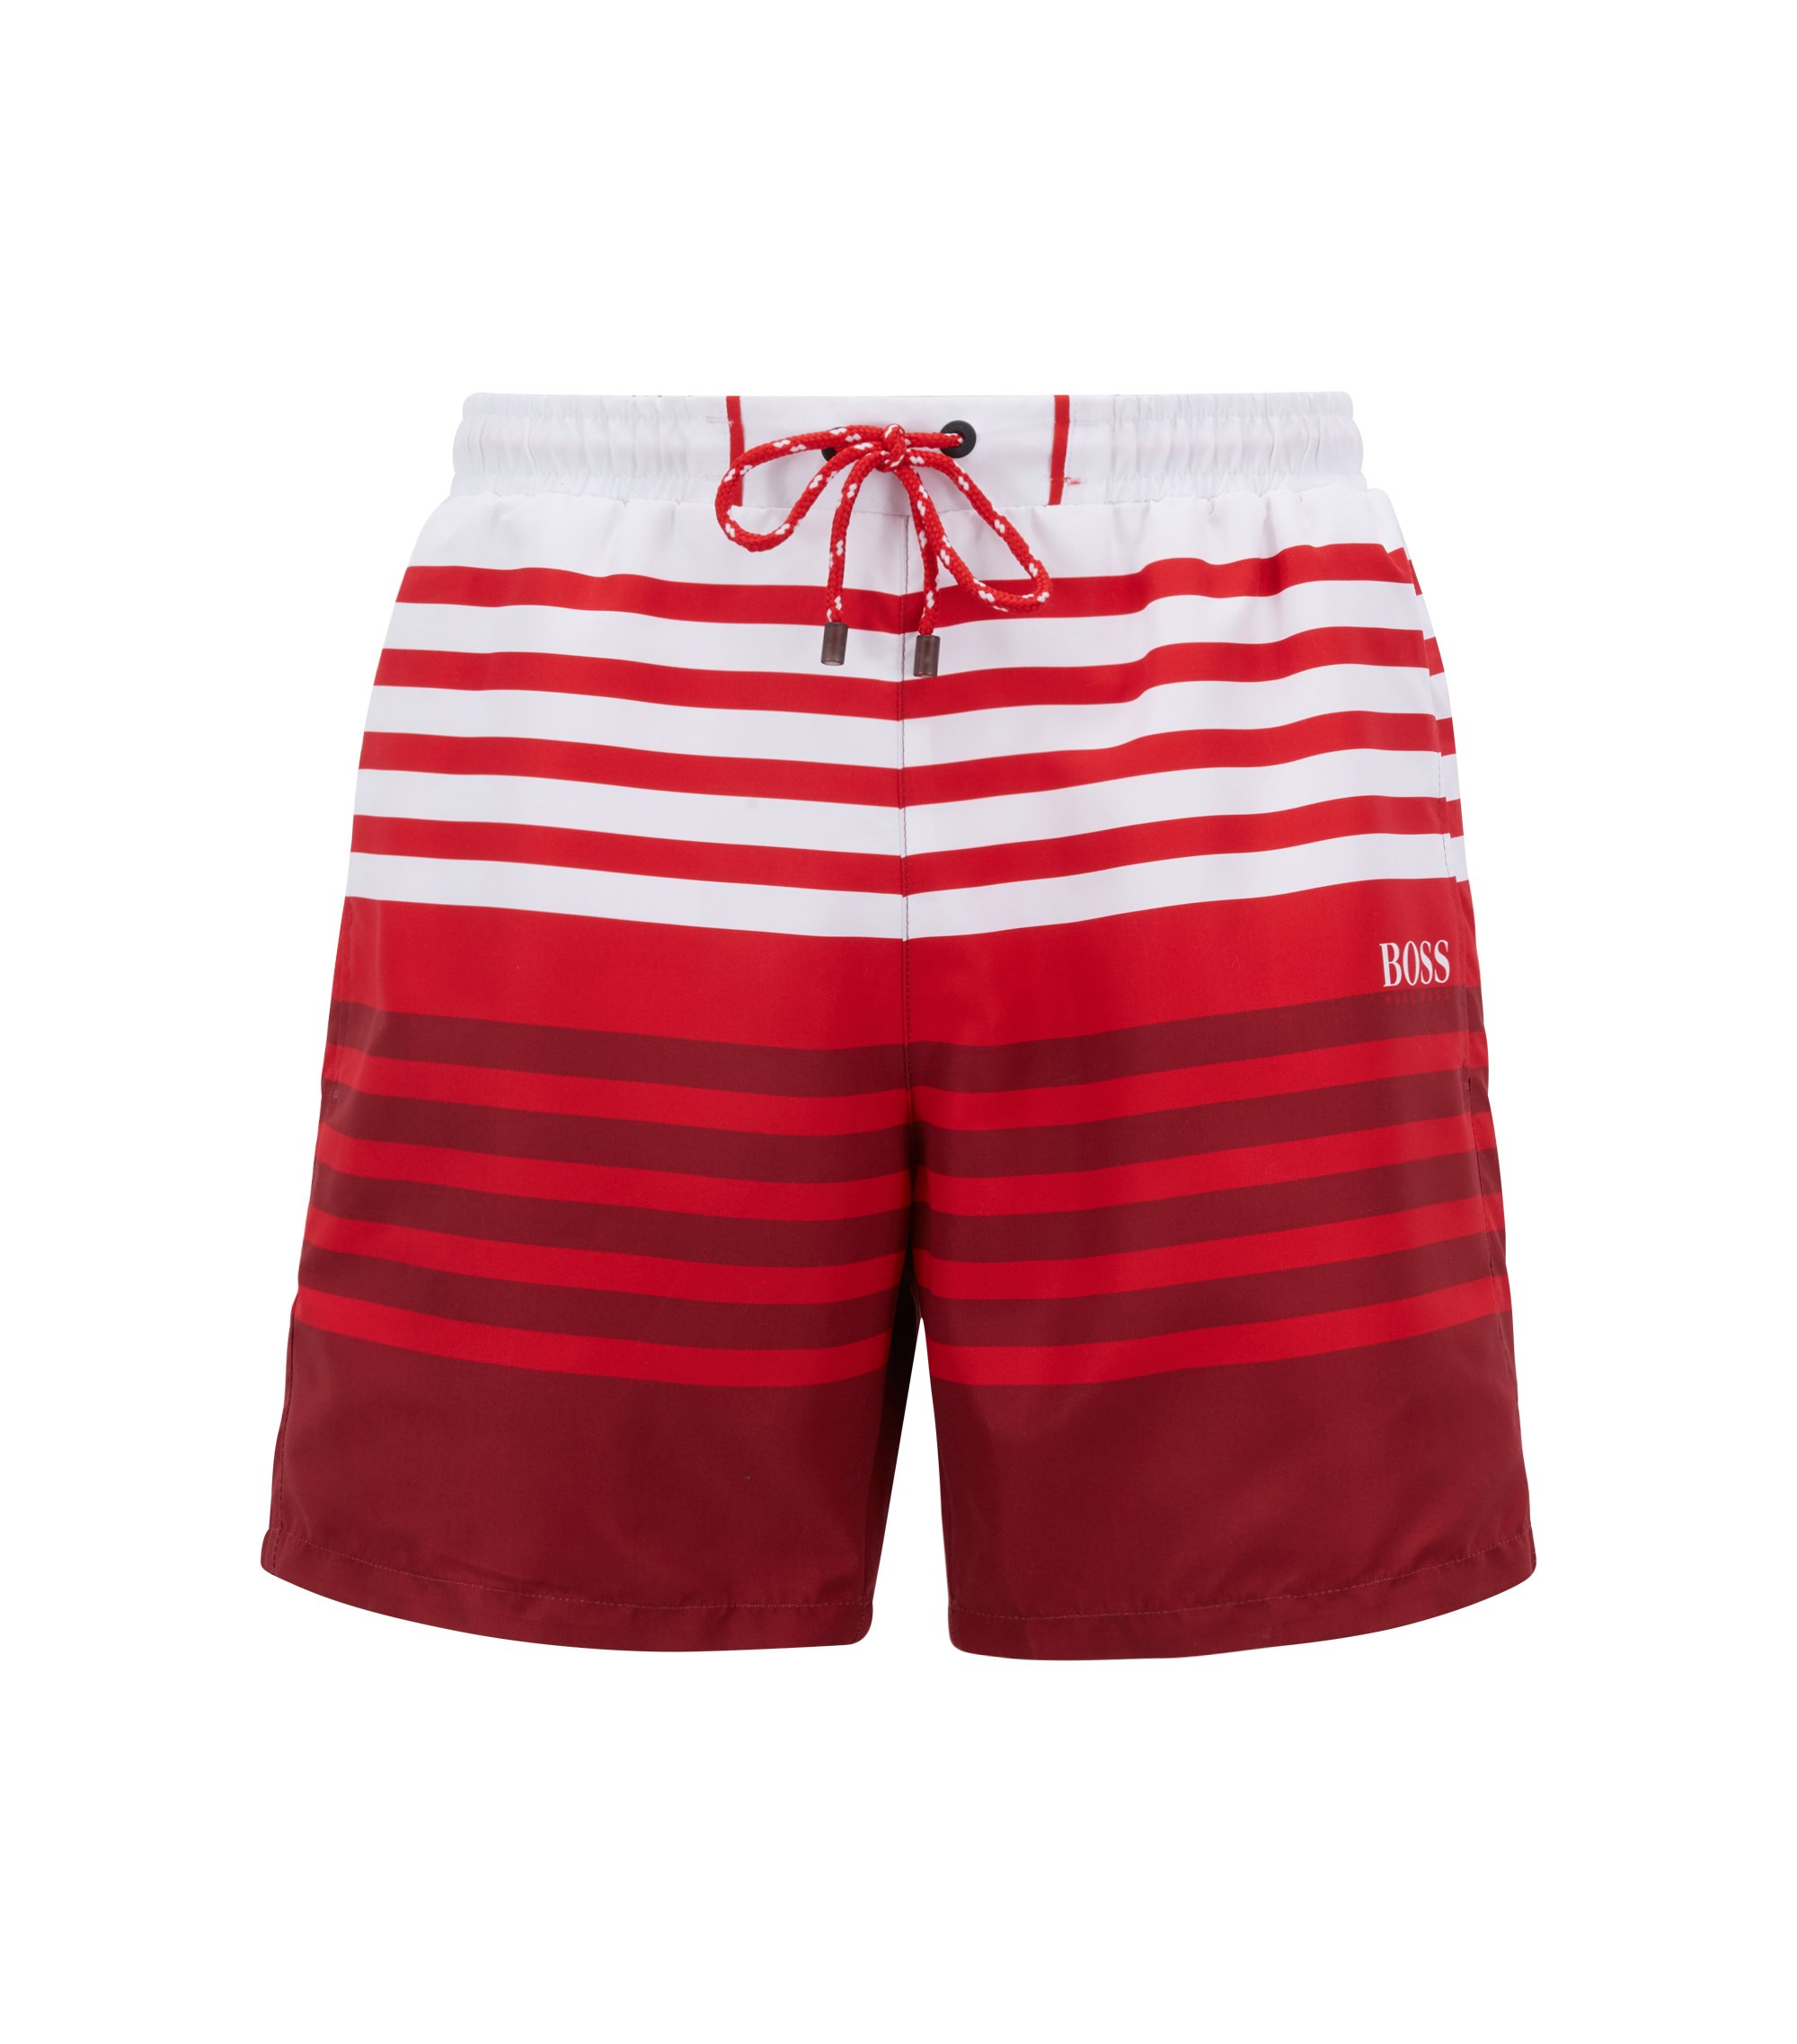 Bañador tipo shorts a rayas en tejido técnico con función de secado rápido, Rojo claro